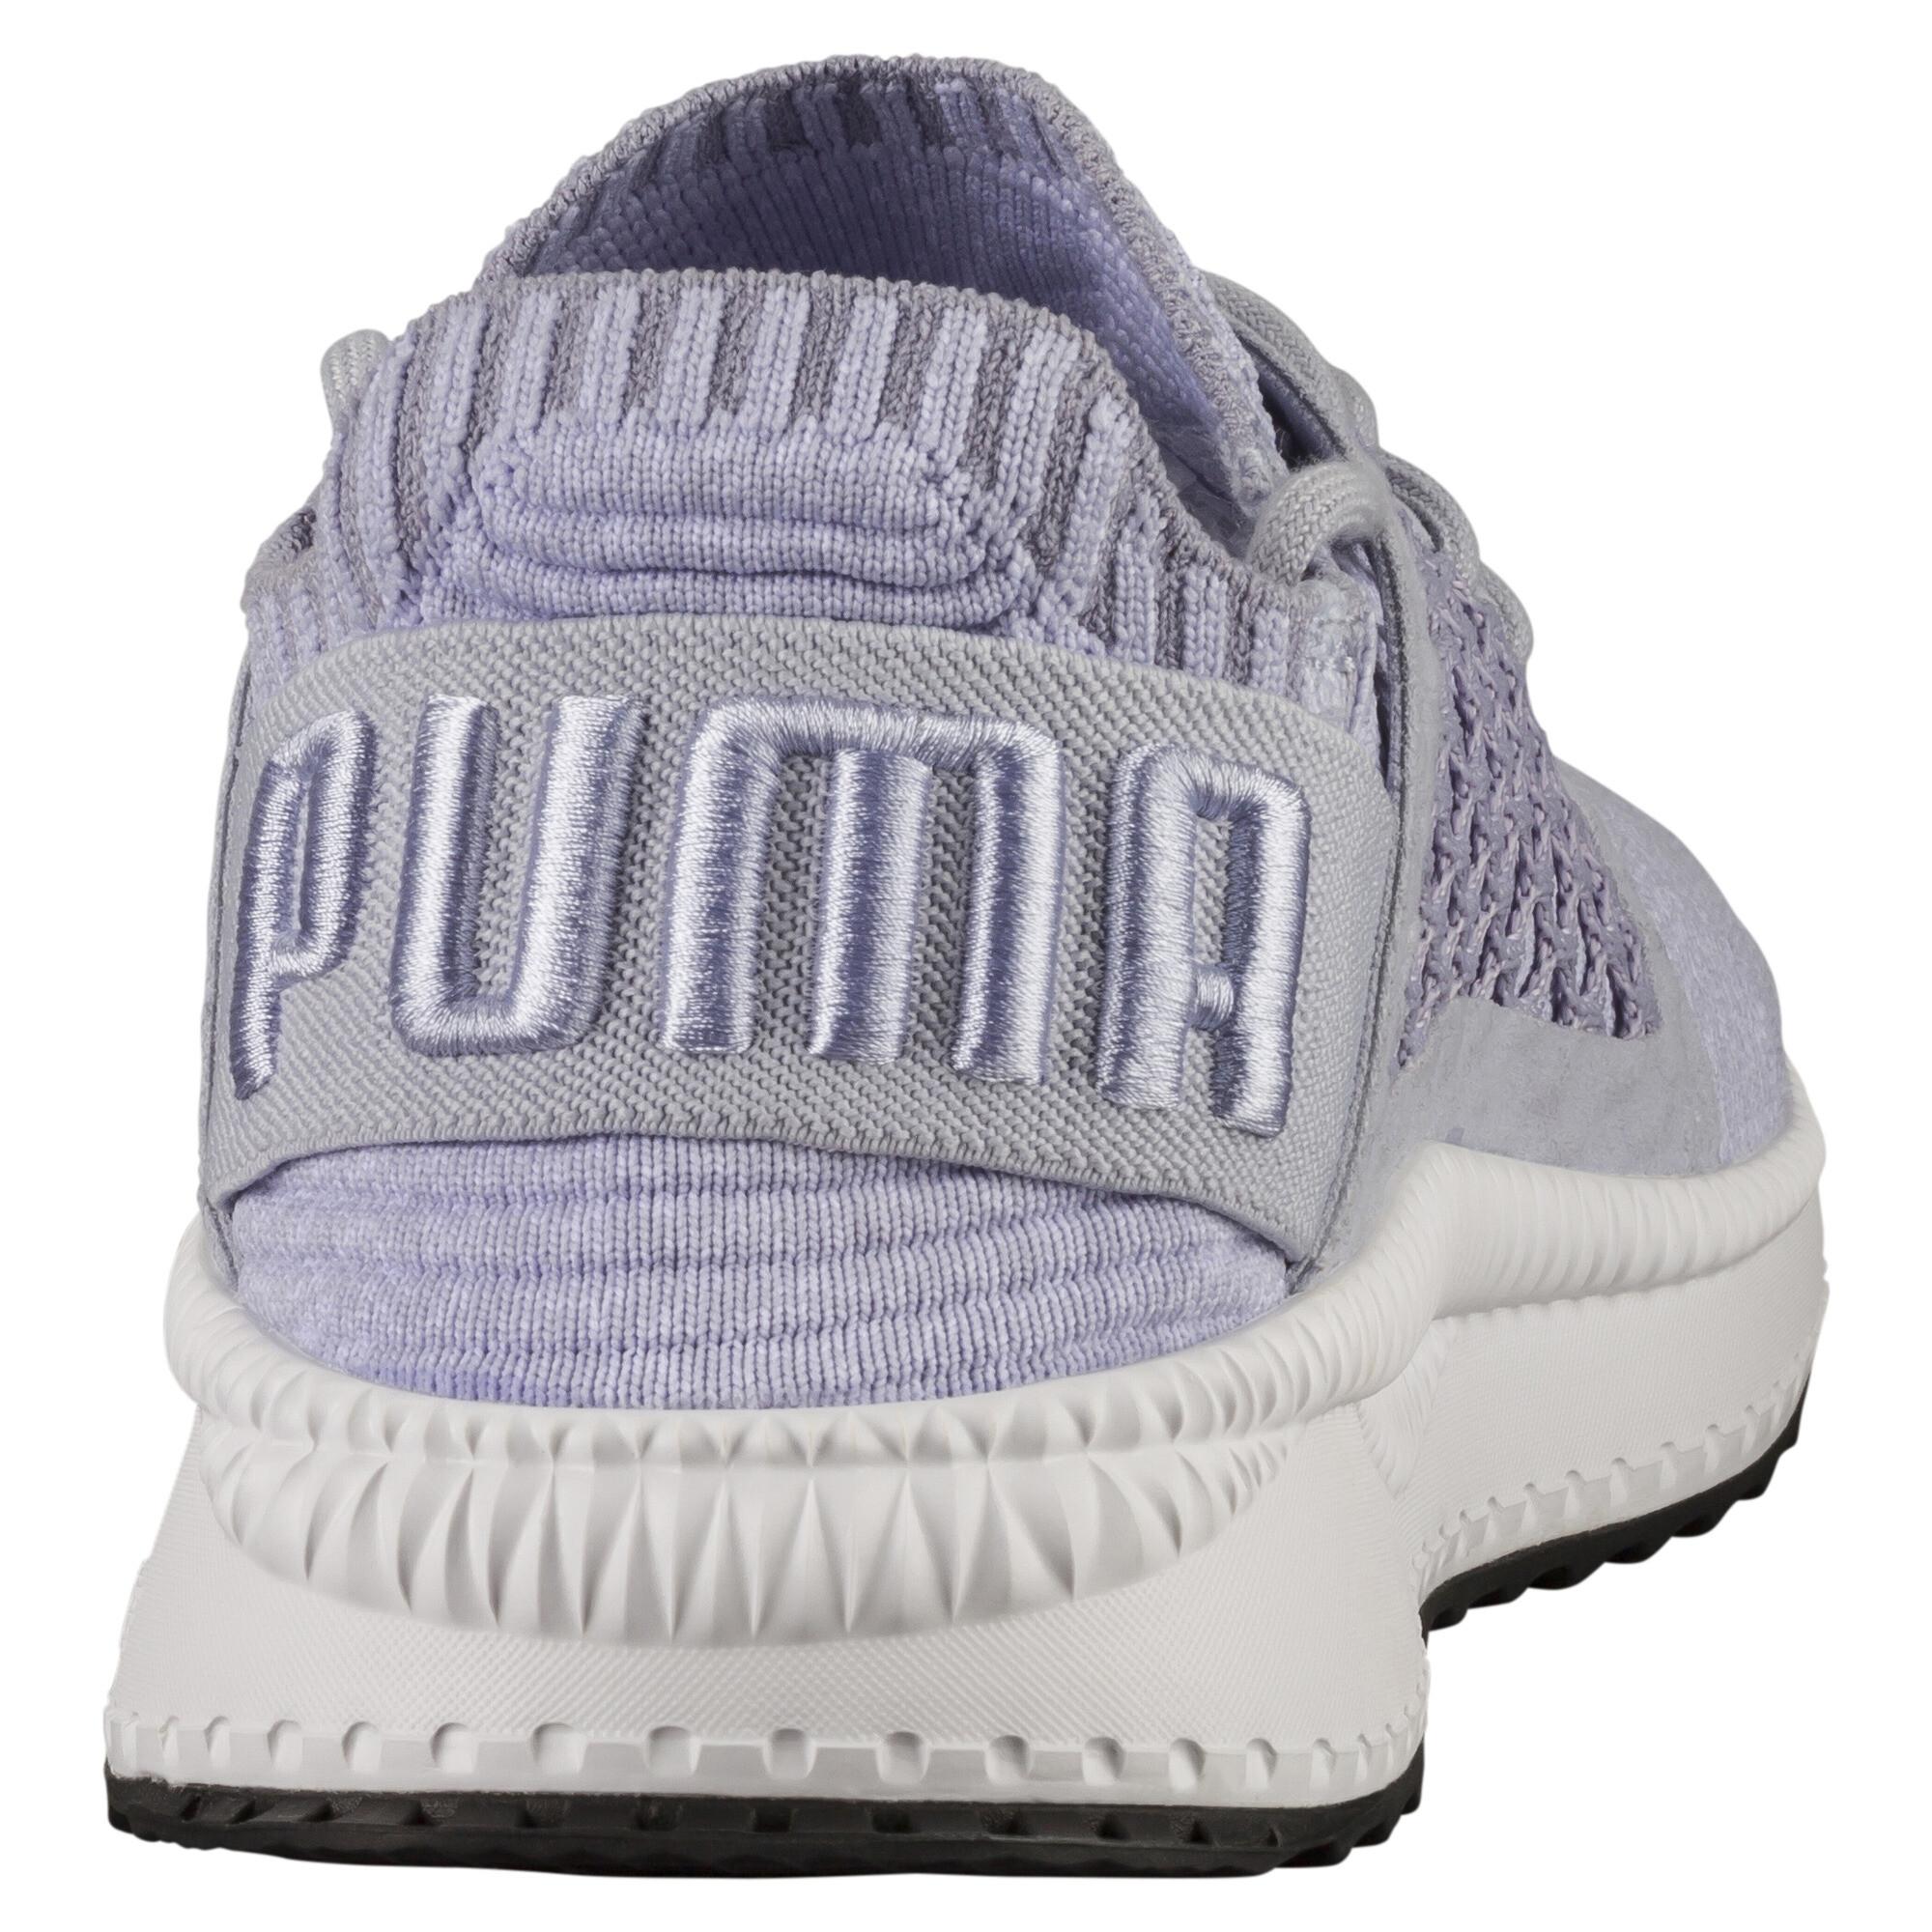 PUMA-TSUGI-NETFIT-evoKNIT-Sneaker-Frauen-Schuhe-Neu Indexbild 8